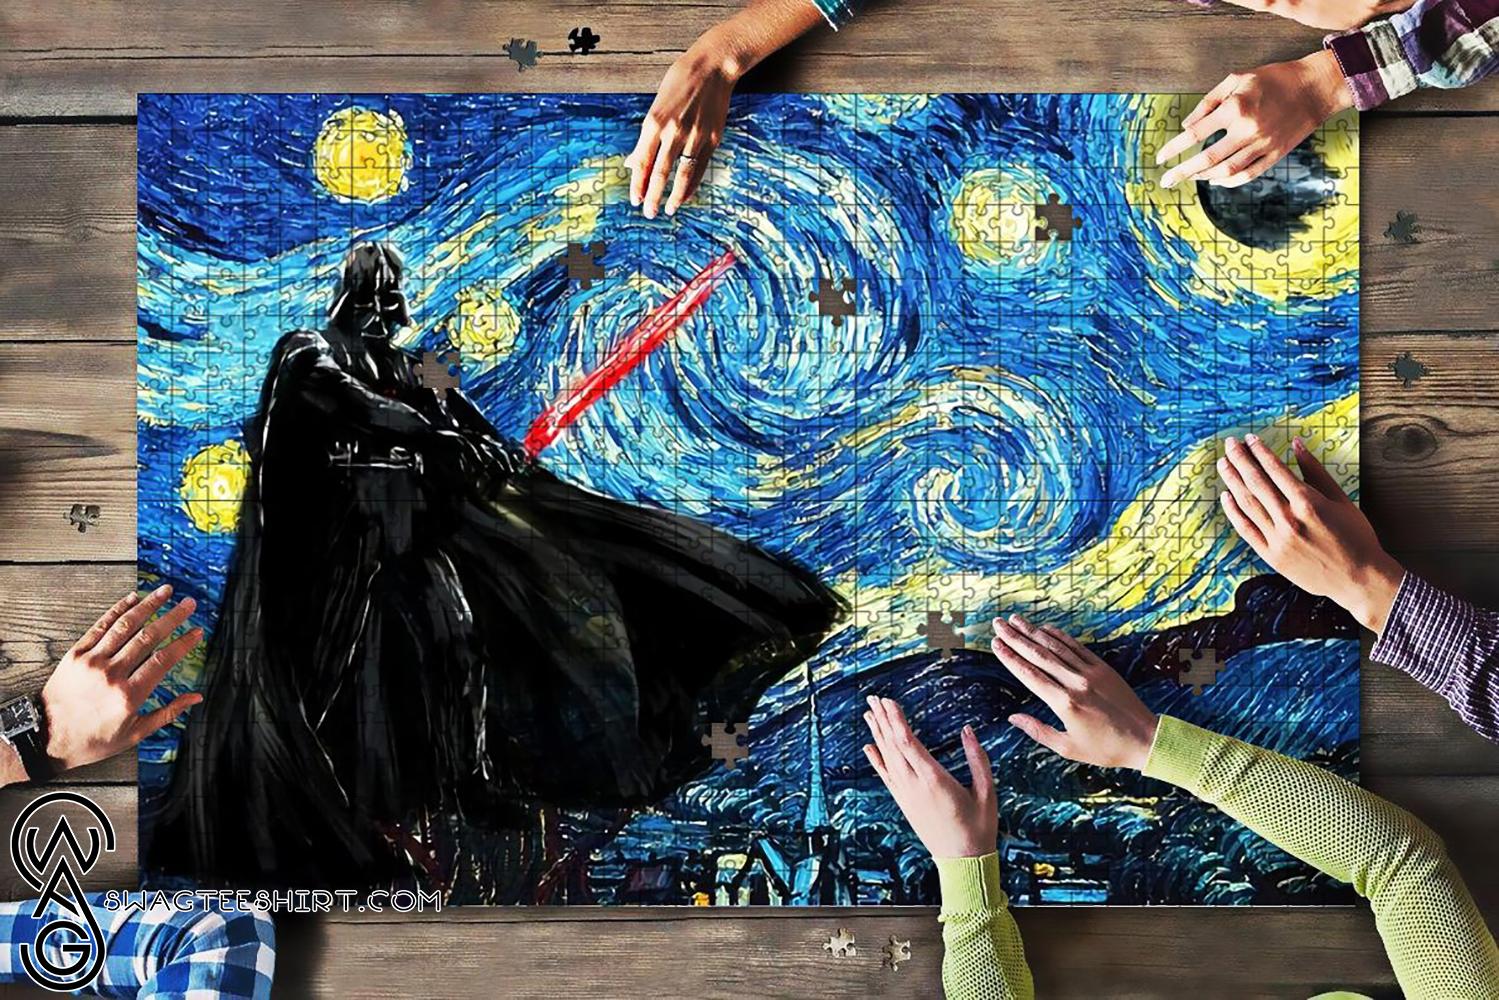 Vincent van gogh starry night darth vader star wars jigsaw puzzle - maria